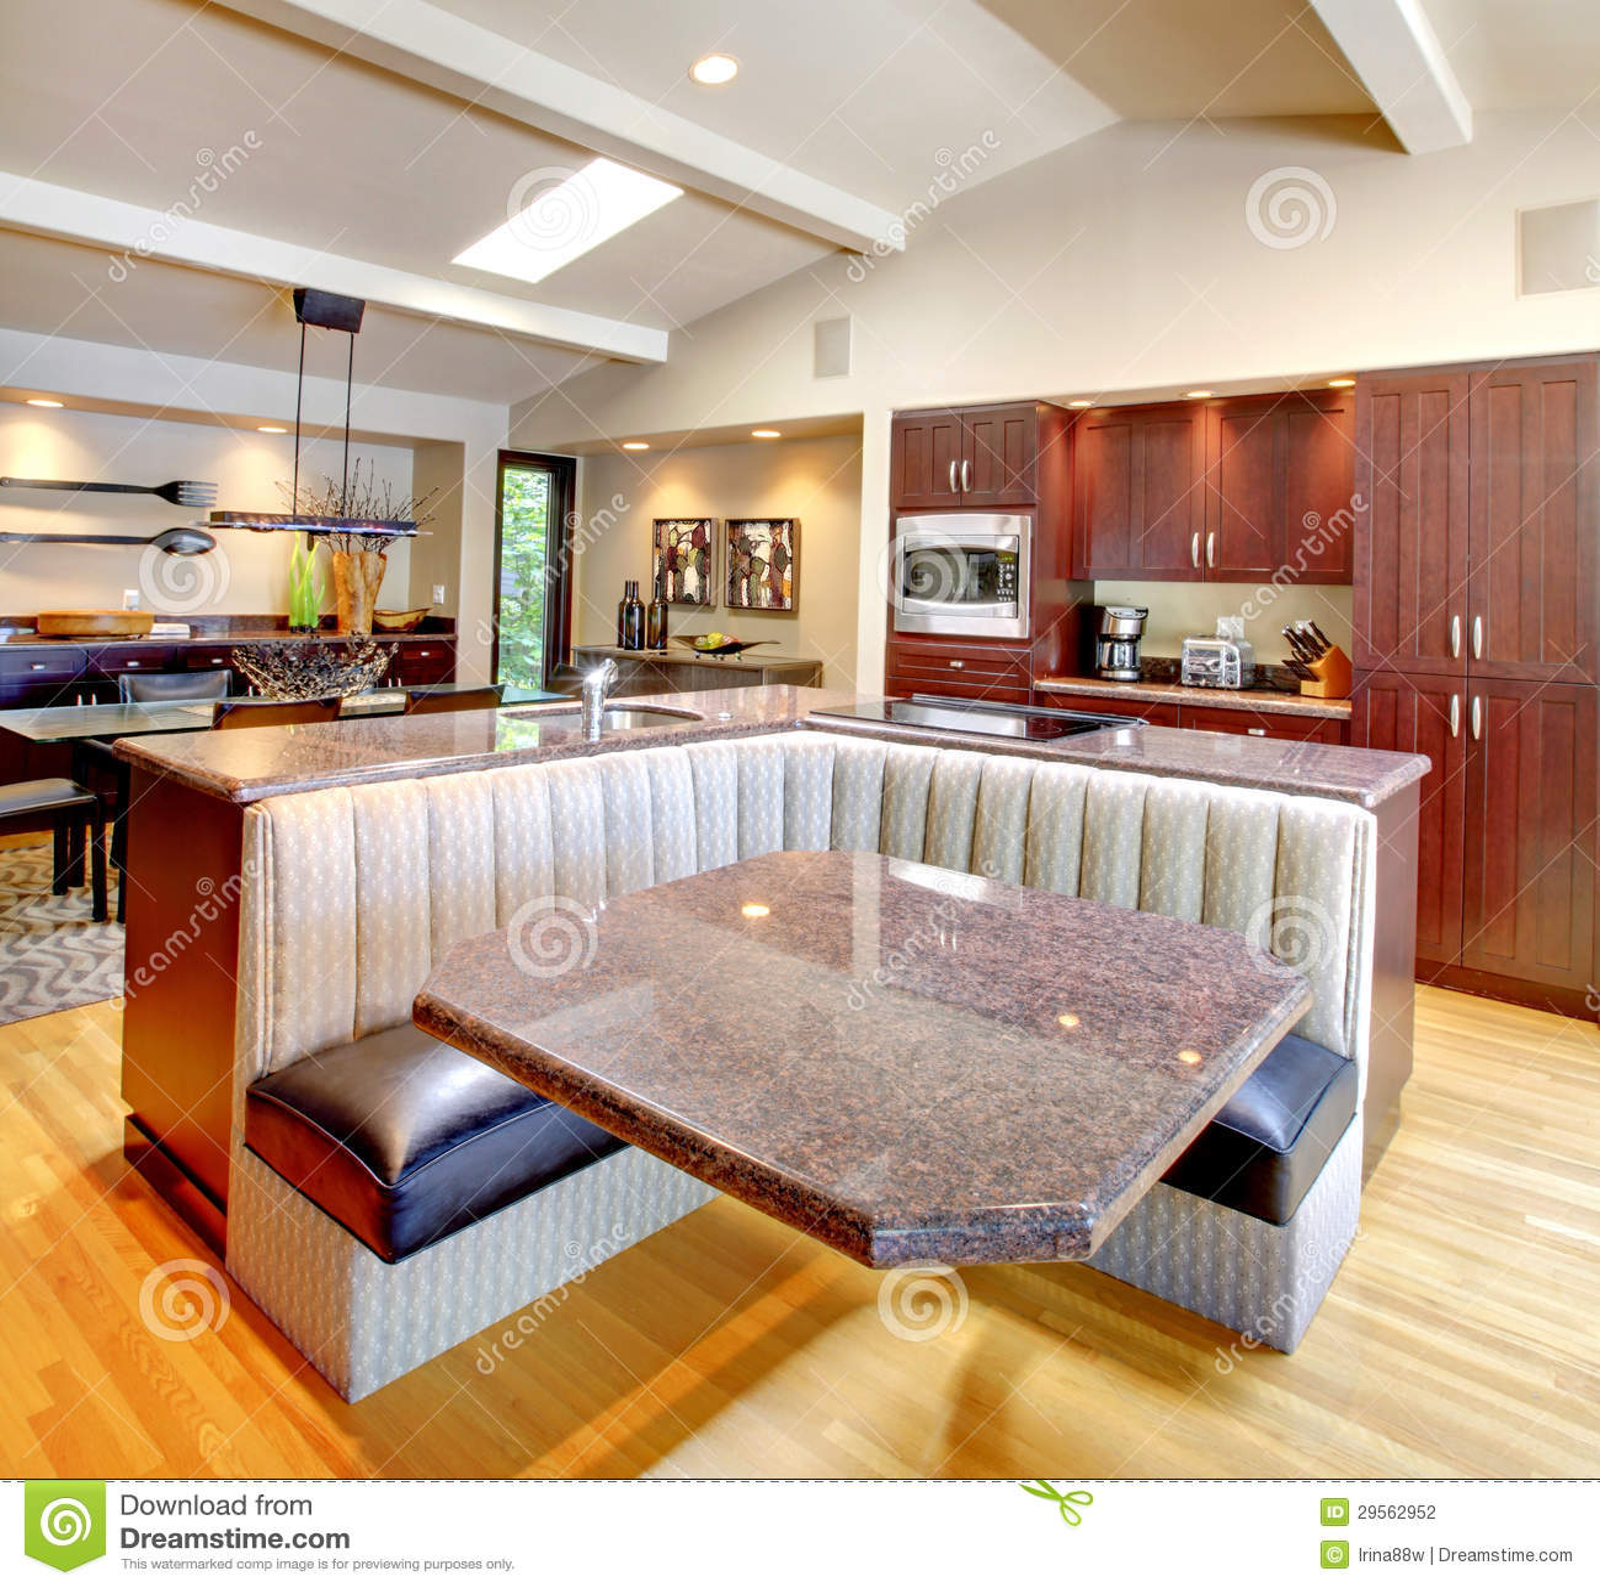 Luxury Mahogany Kitchen With Modern Furniture. Stock